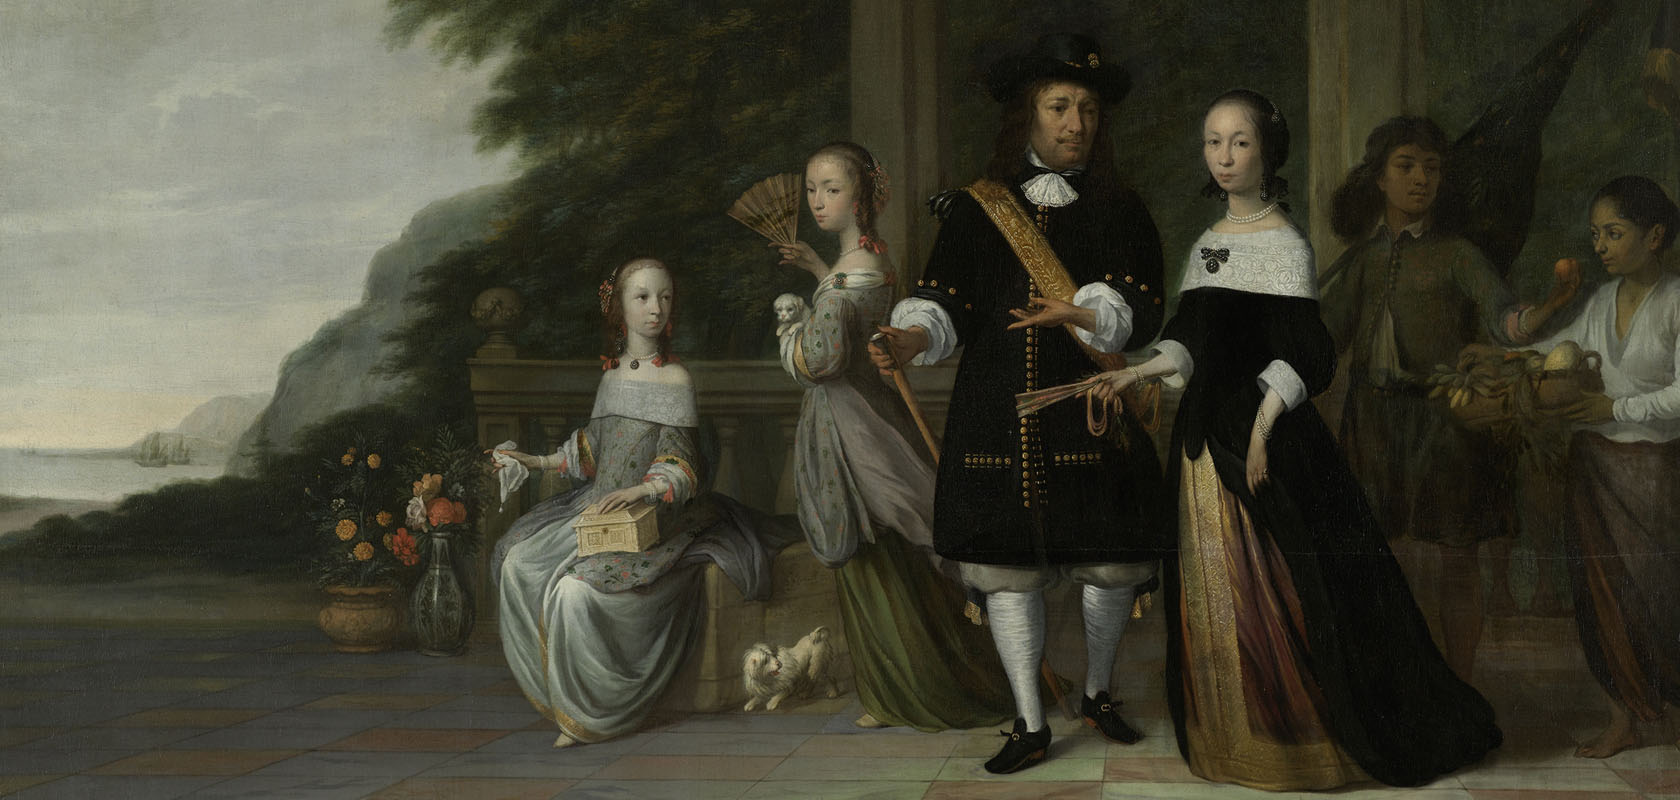 Jacob-Coeman-Surapati-en-een-tot-slaaf-gemaakte-bediende-naast-de-familie-Cnoll-1665-Rijksmuseum-1680x800-1